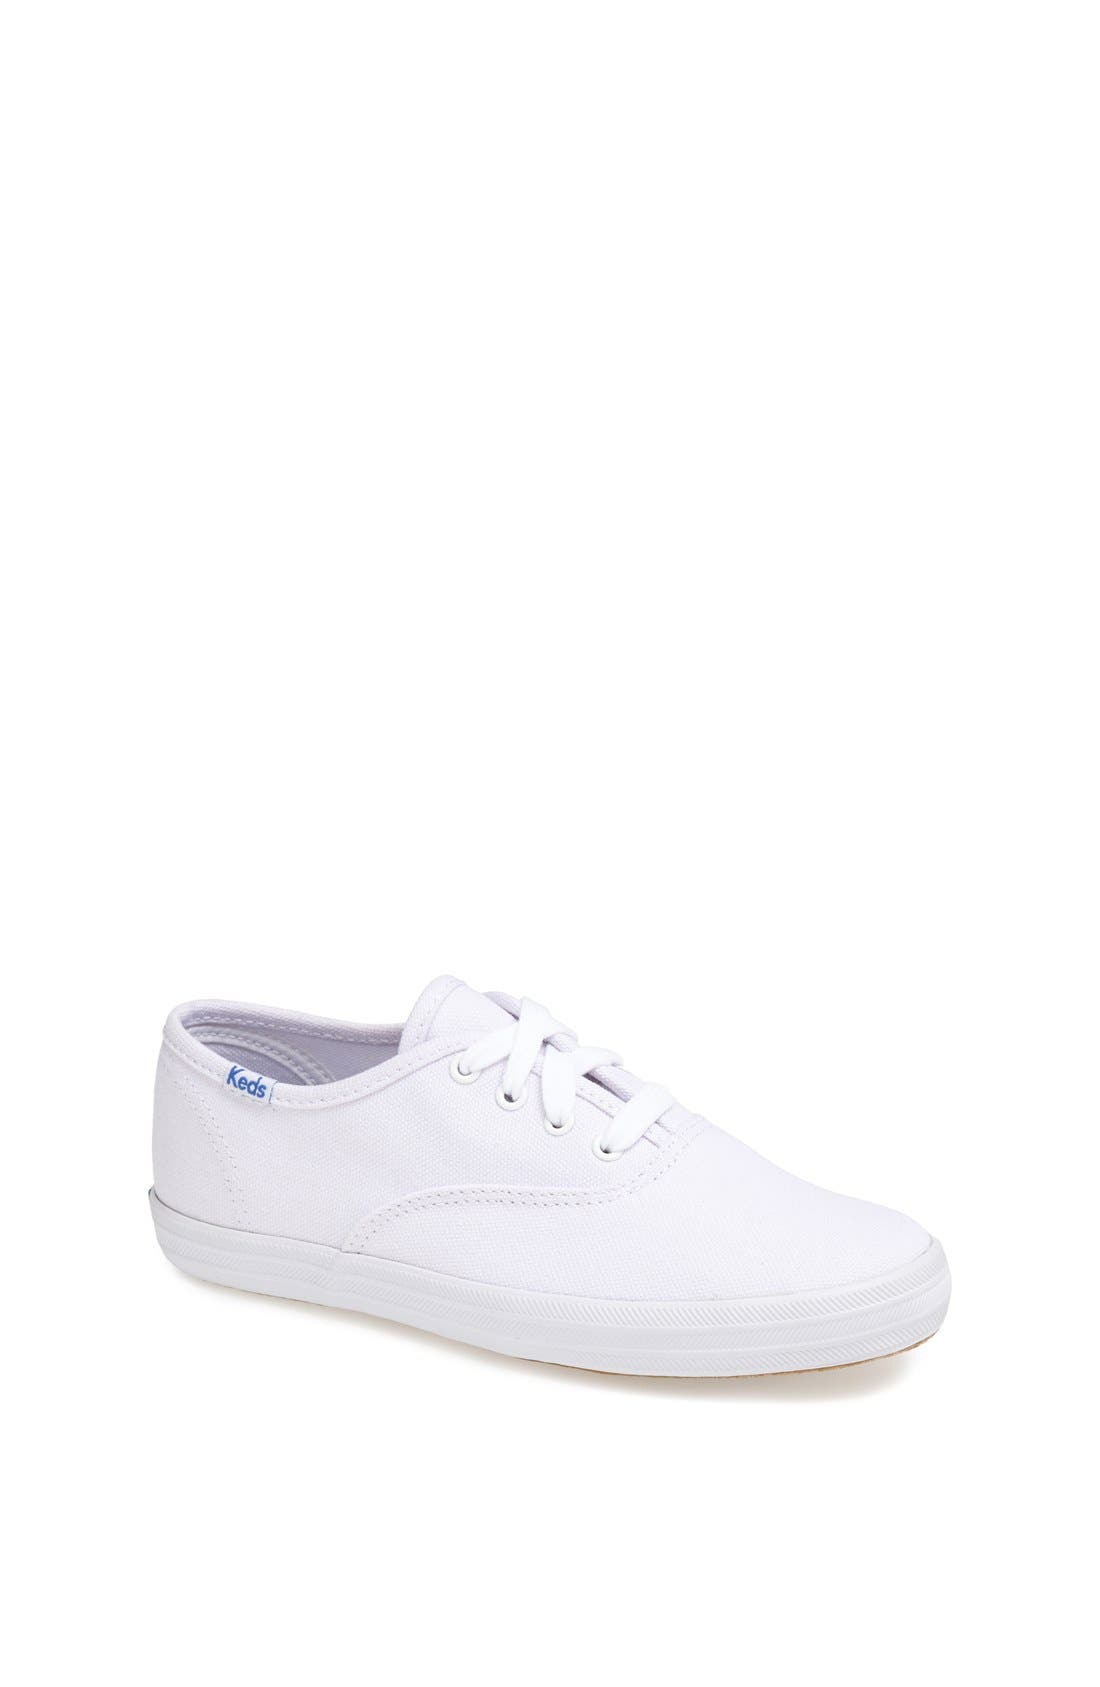 'Champion' Canvas Sneaker, Main, color, NEW WHITE